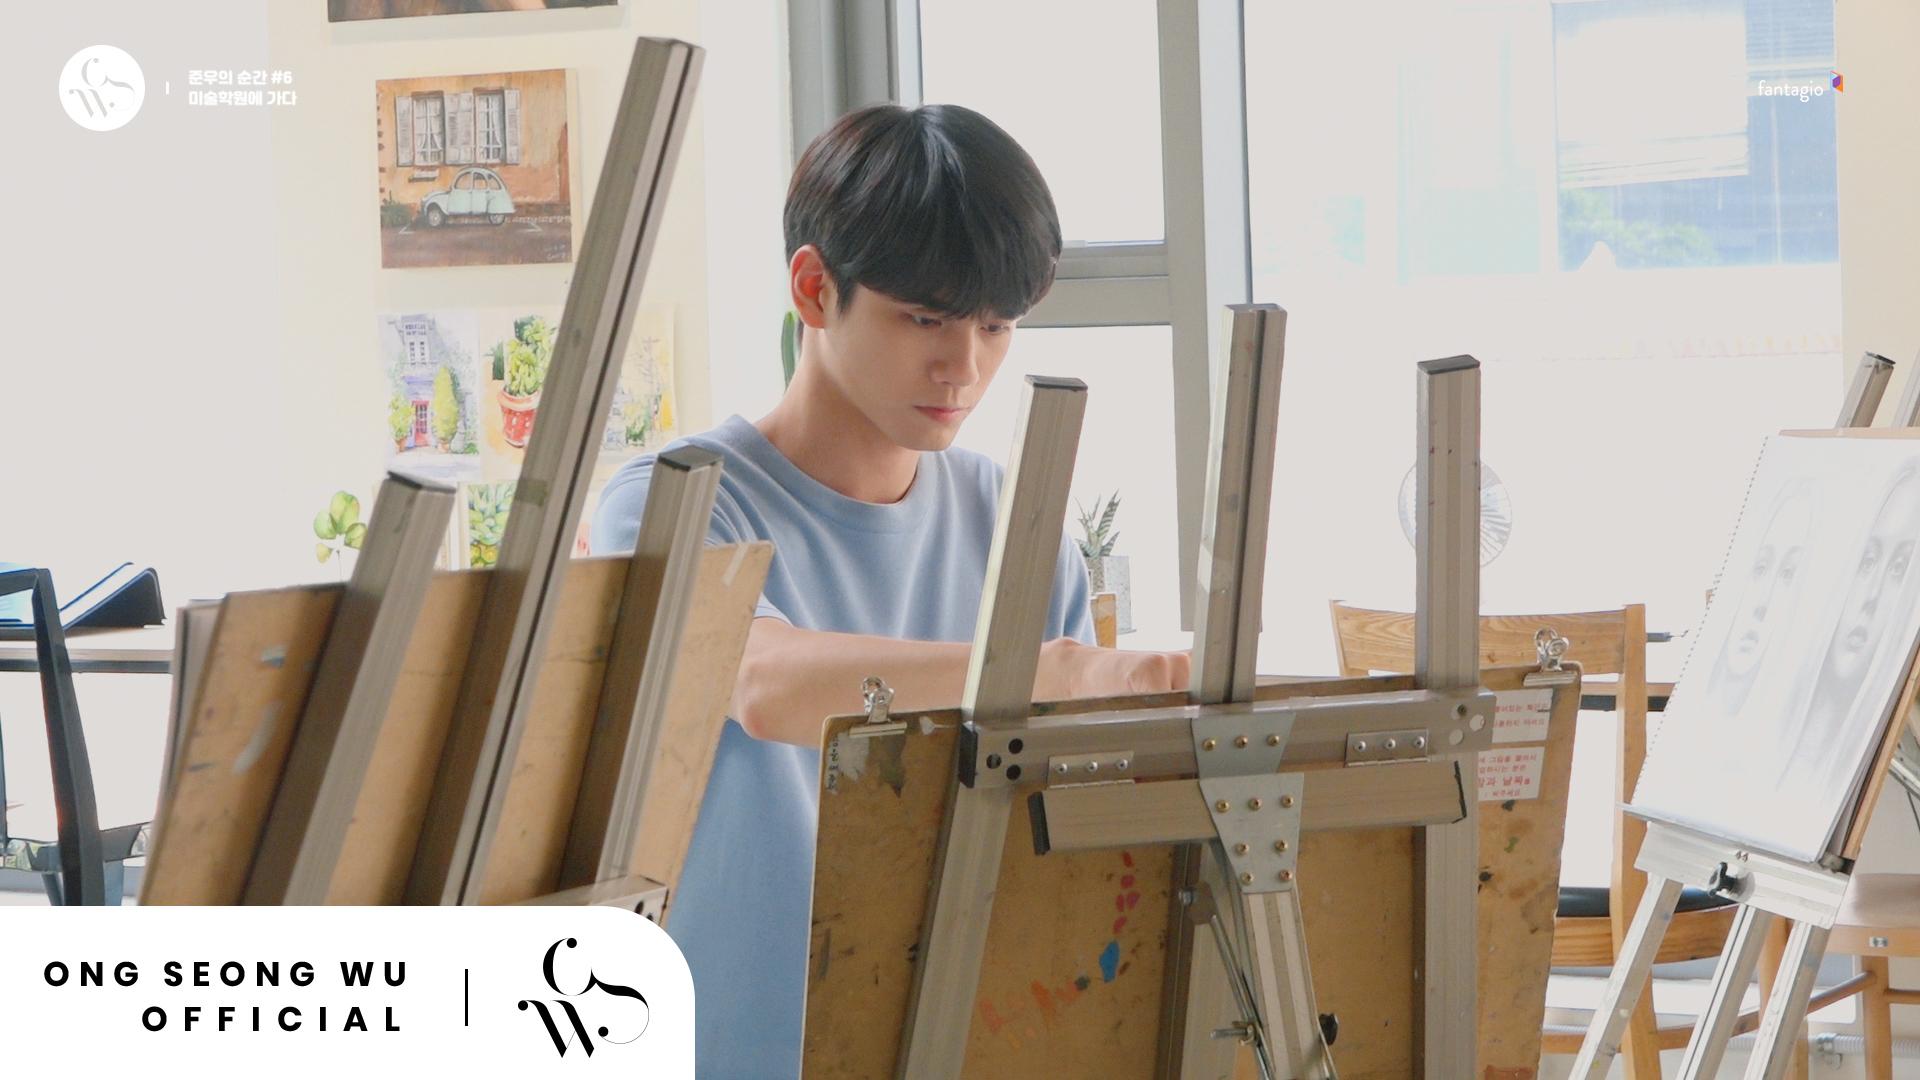 ONG SEONG WU 옹성우 - [준우의 순간] #6 마지막의 순간